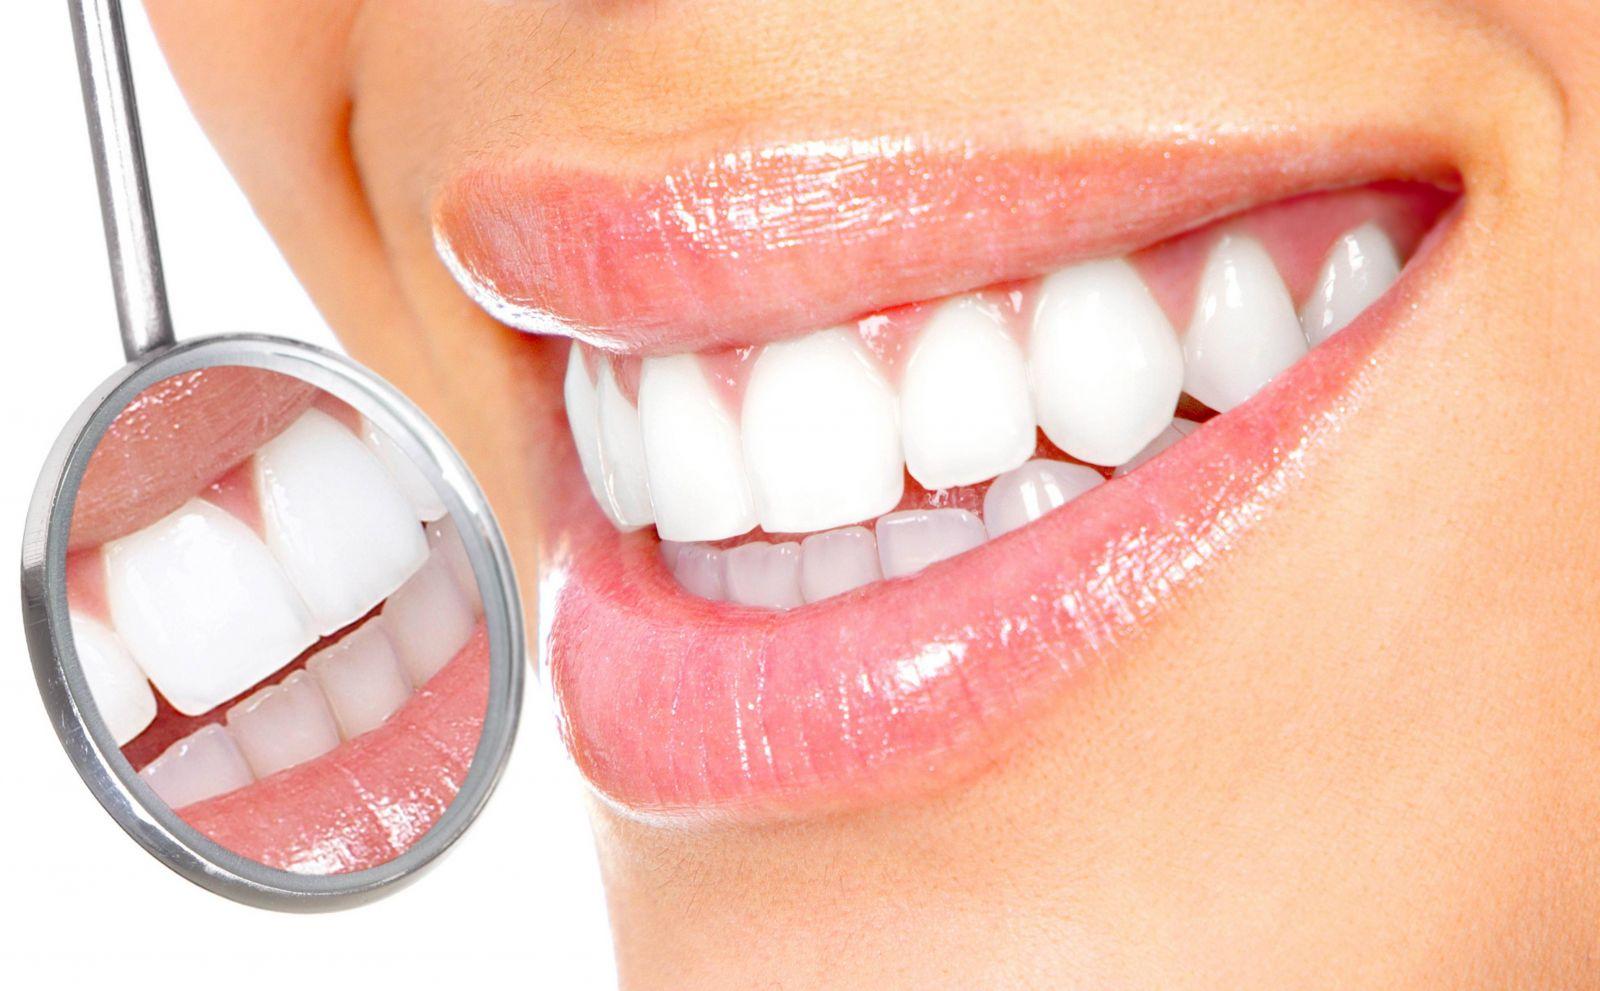 отбеливание зубов в домашних условиях лимон